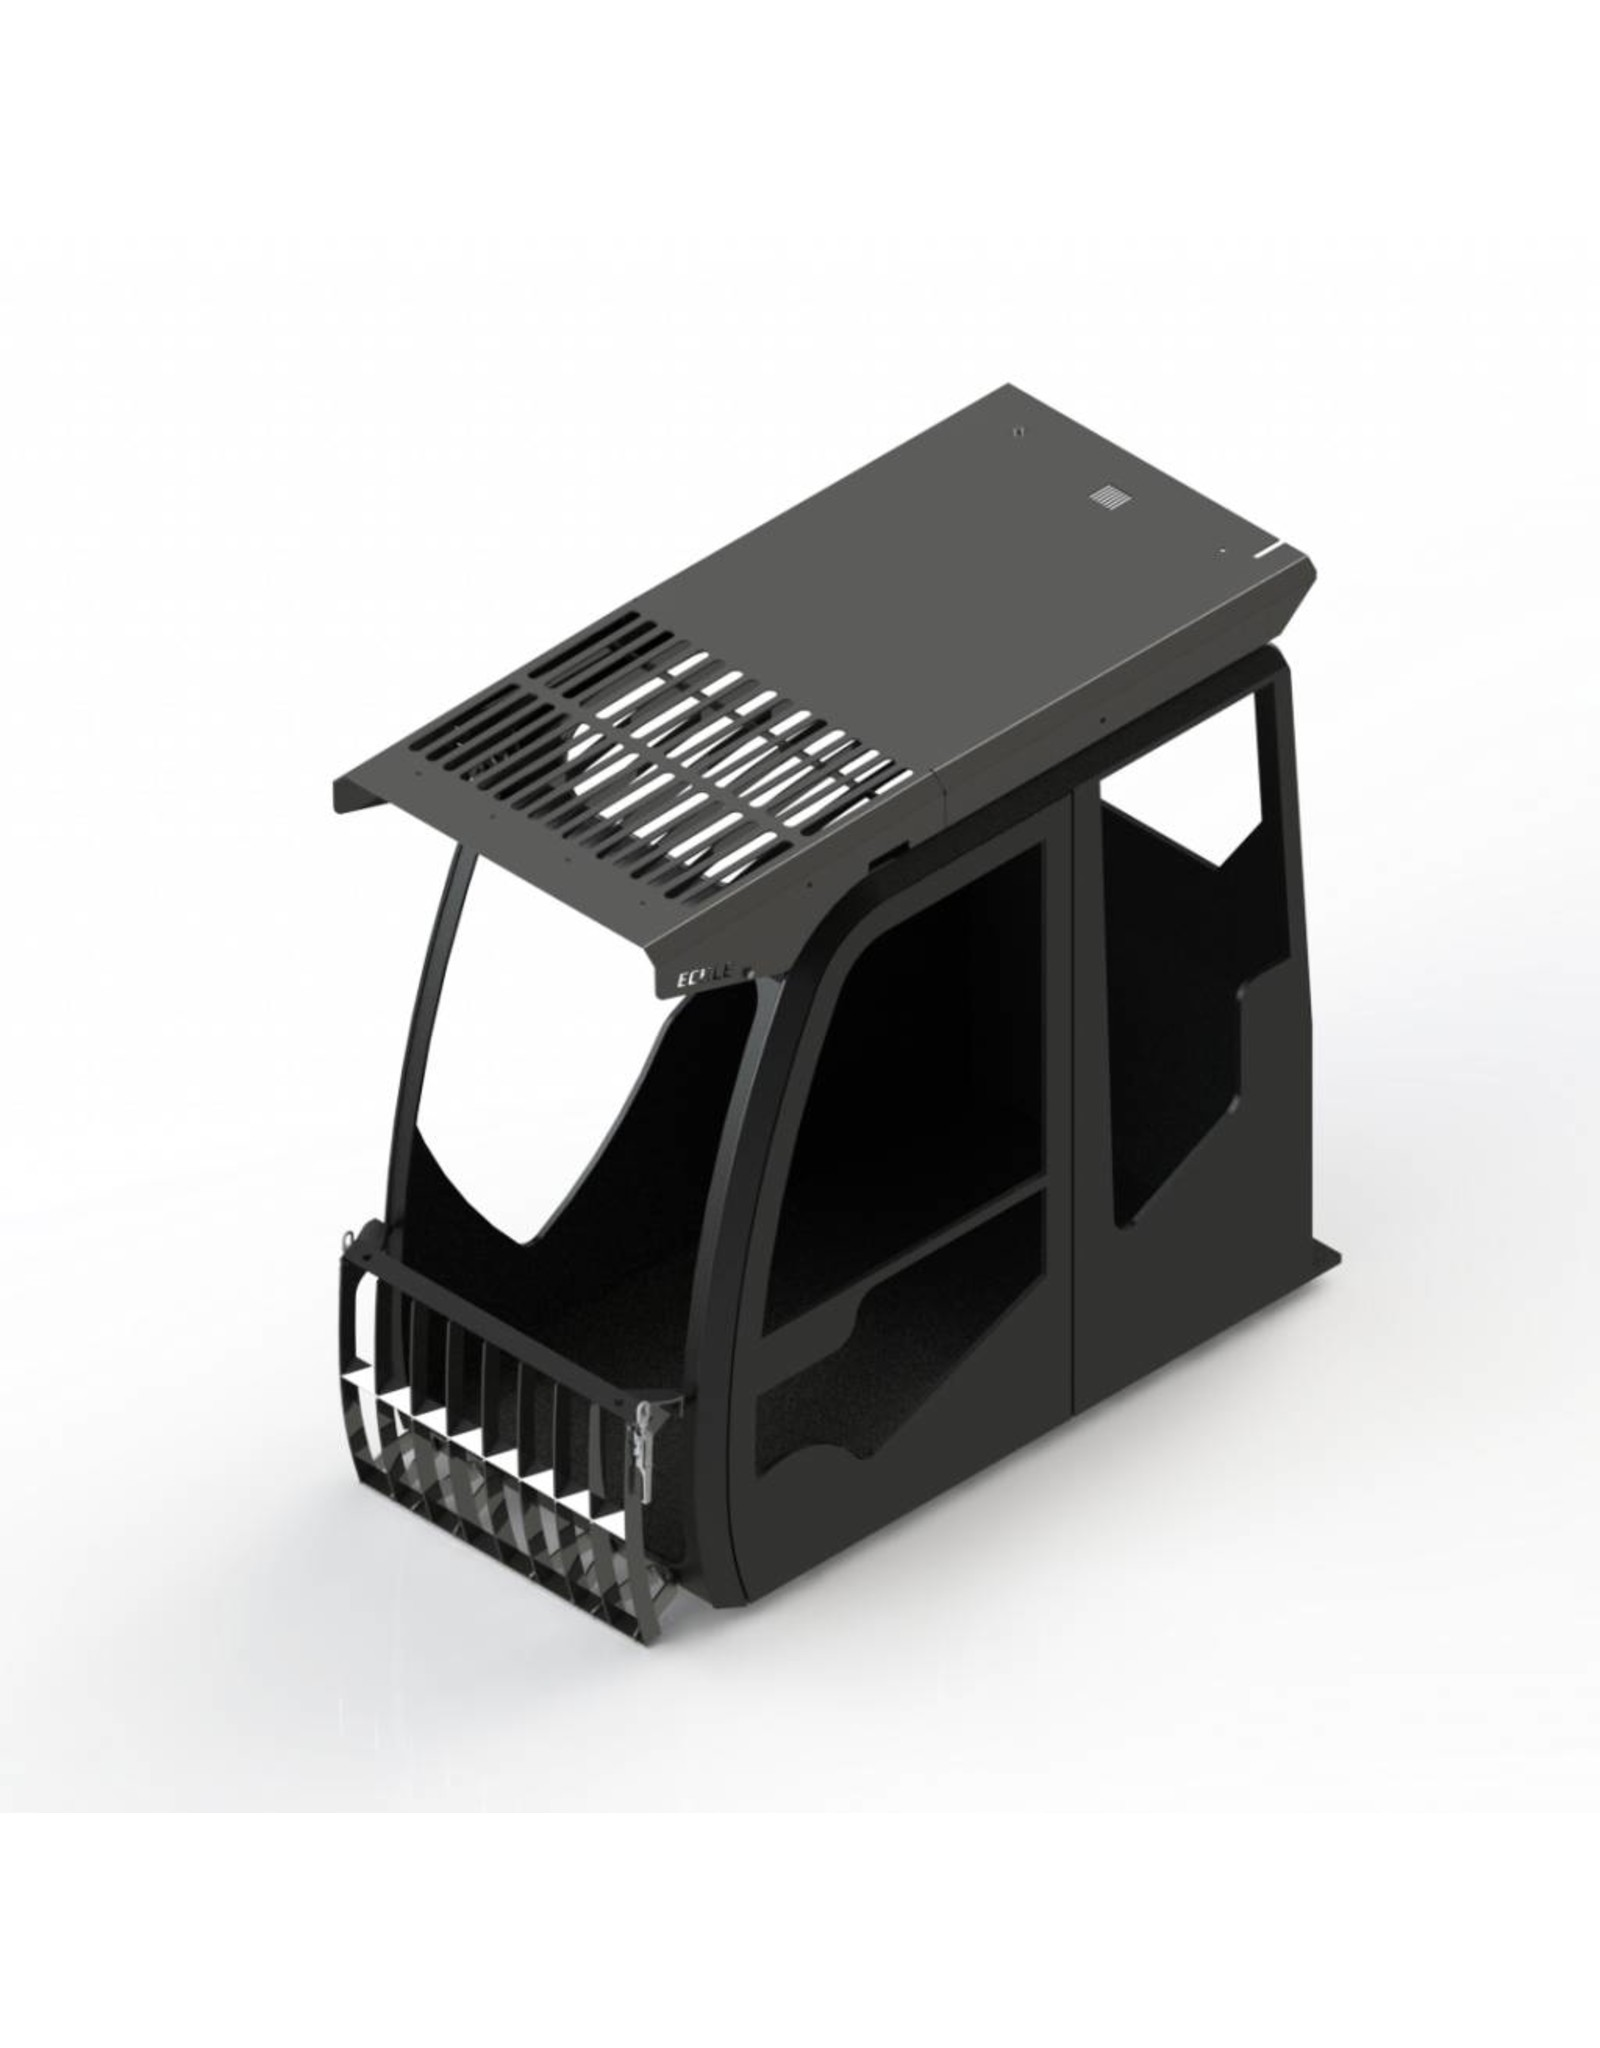 Echle Hartstahl GmbH FOPS for Liebherr A 916